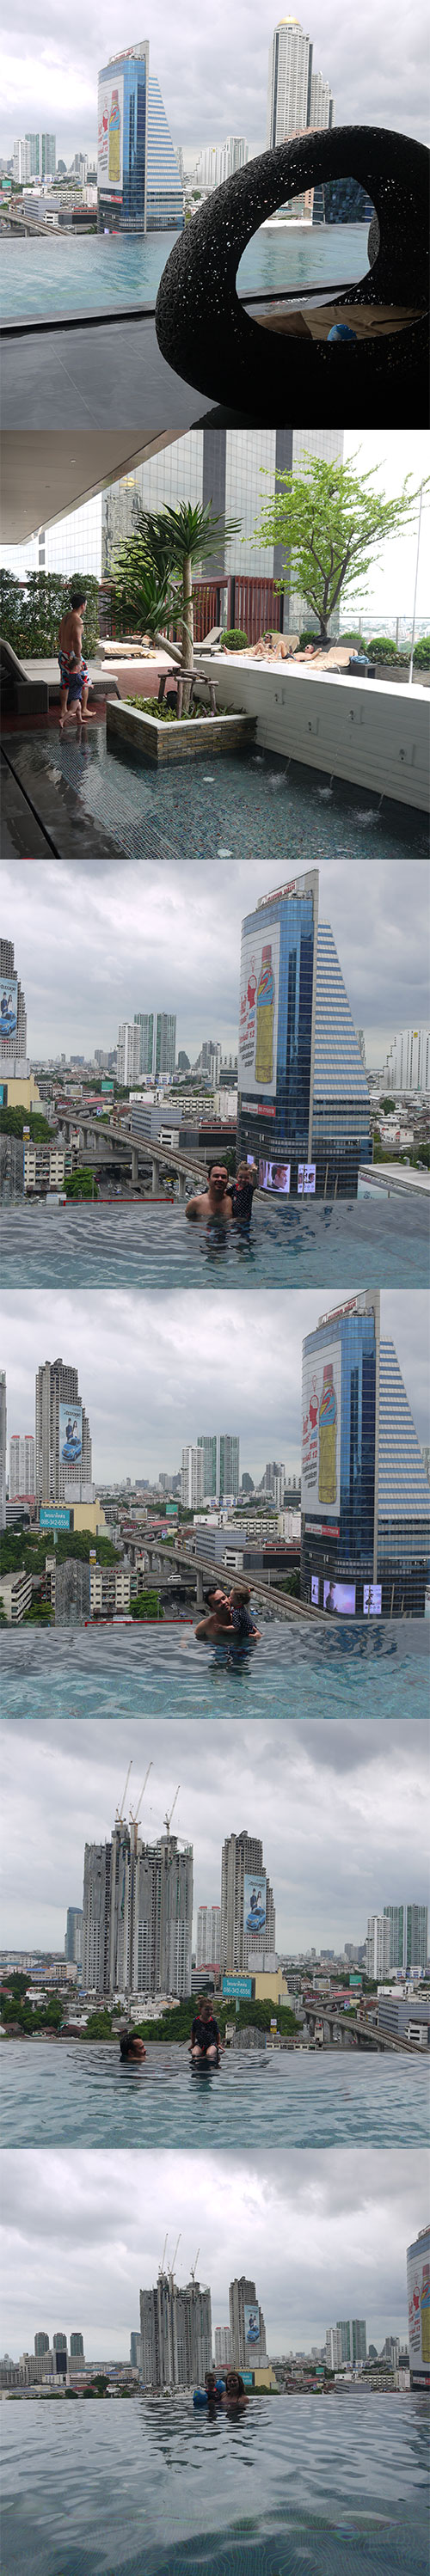 Bangkok-voyage-famille-pimpandpomme-thailande-3